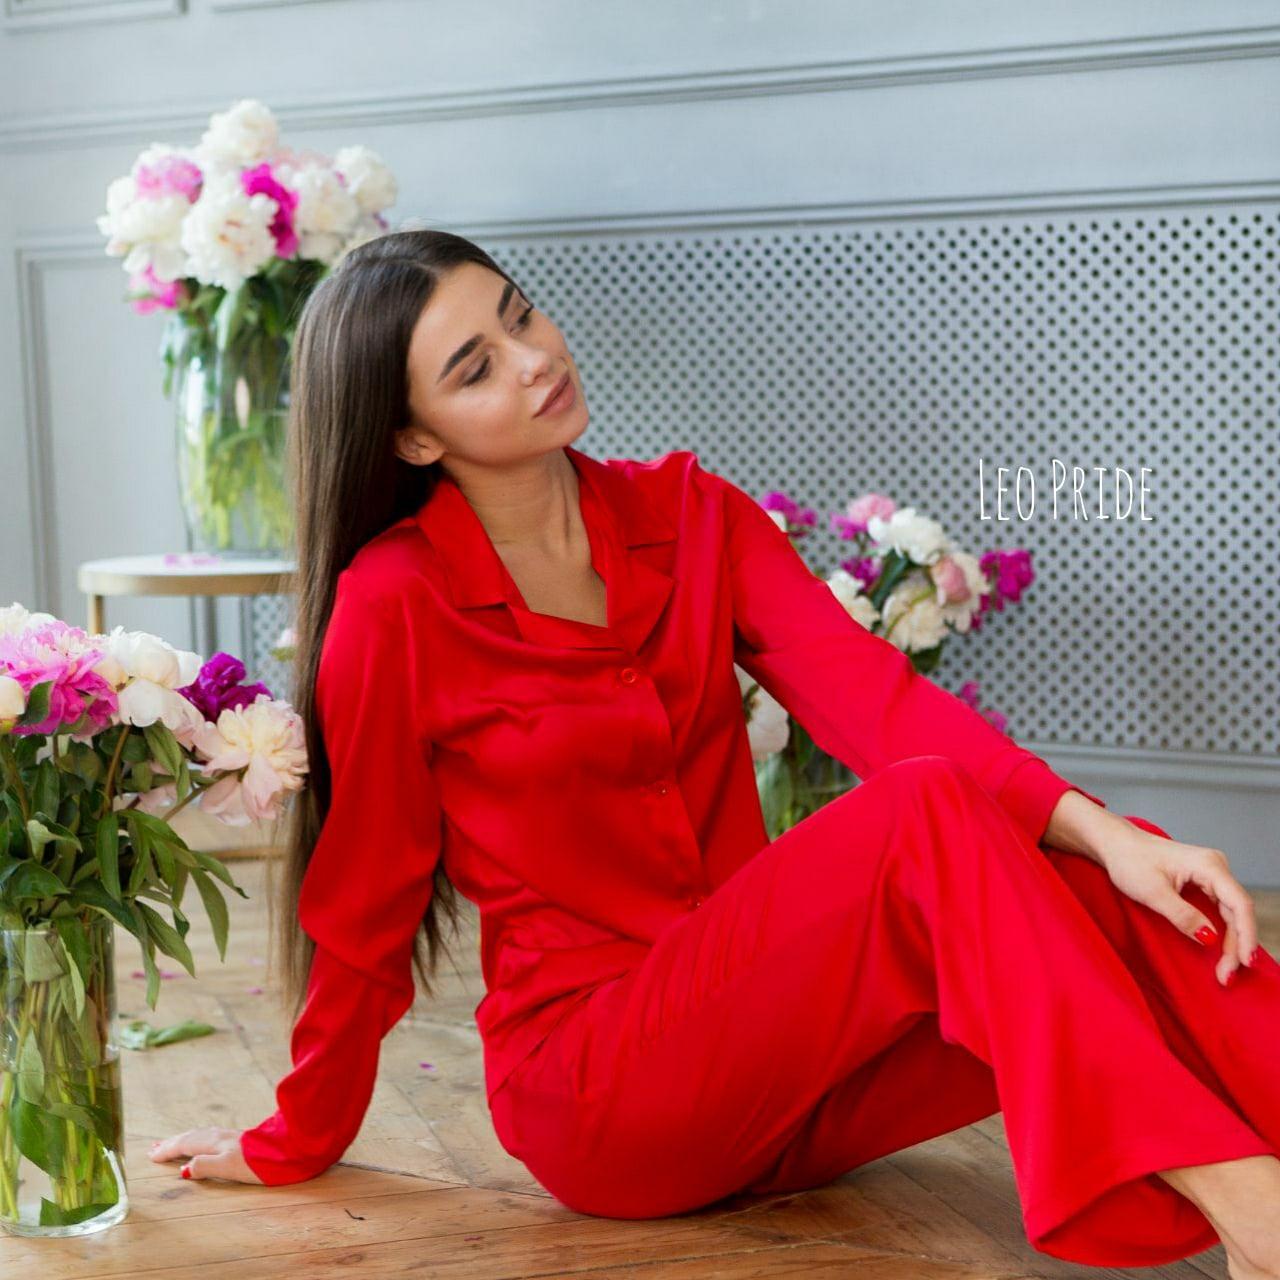 Женская пижама из шелка с широкими штанами и рубашкой 641984